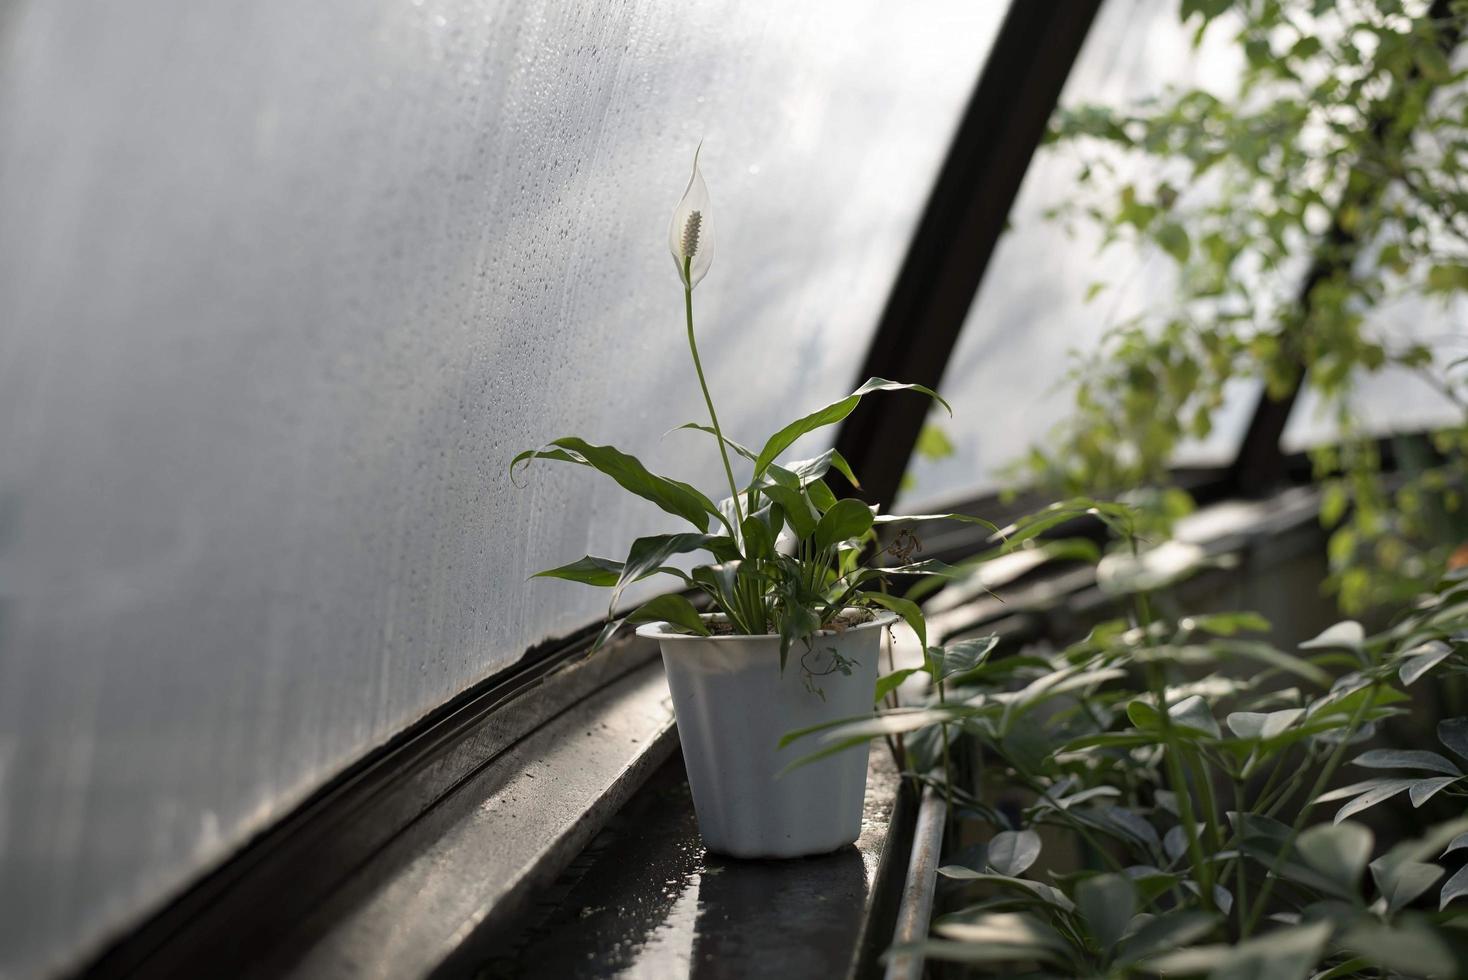 Lirio de la paz blanco en maceta en invernadero foto